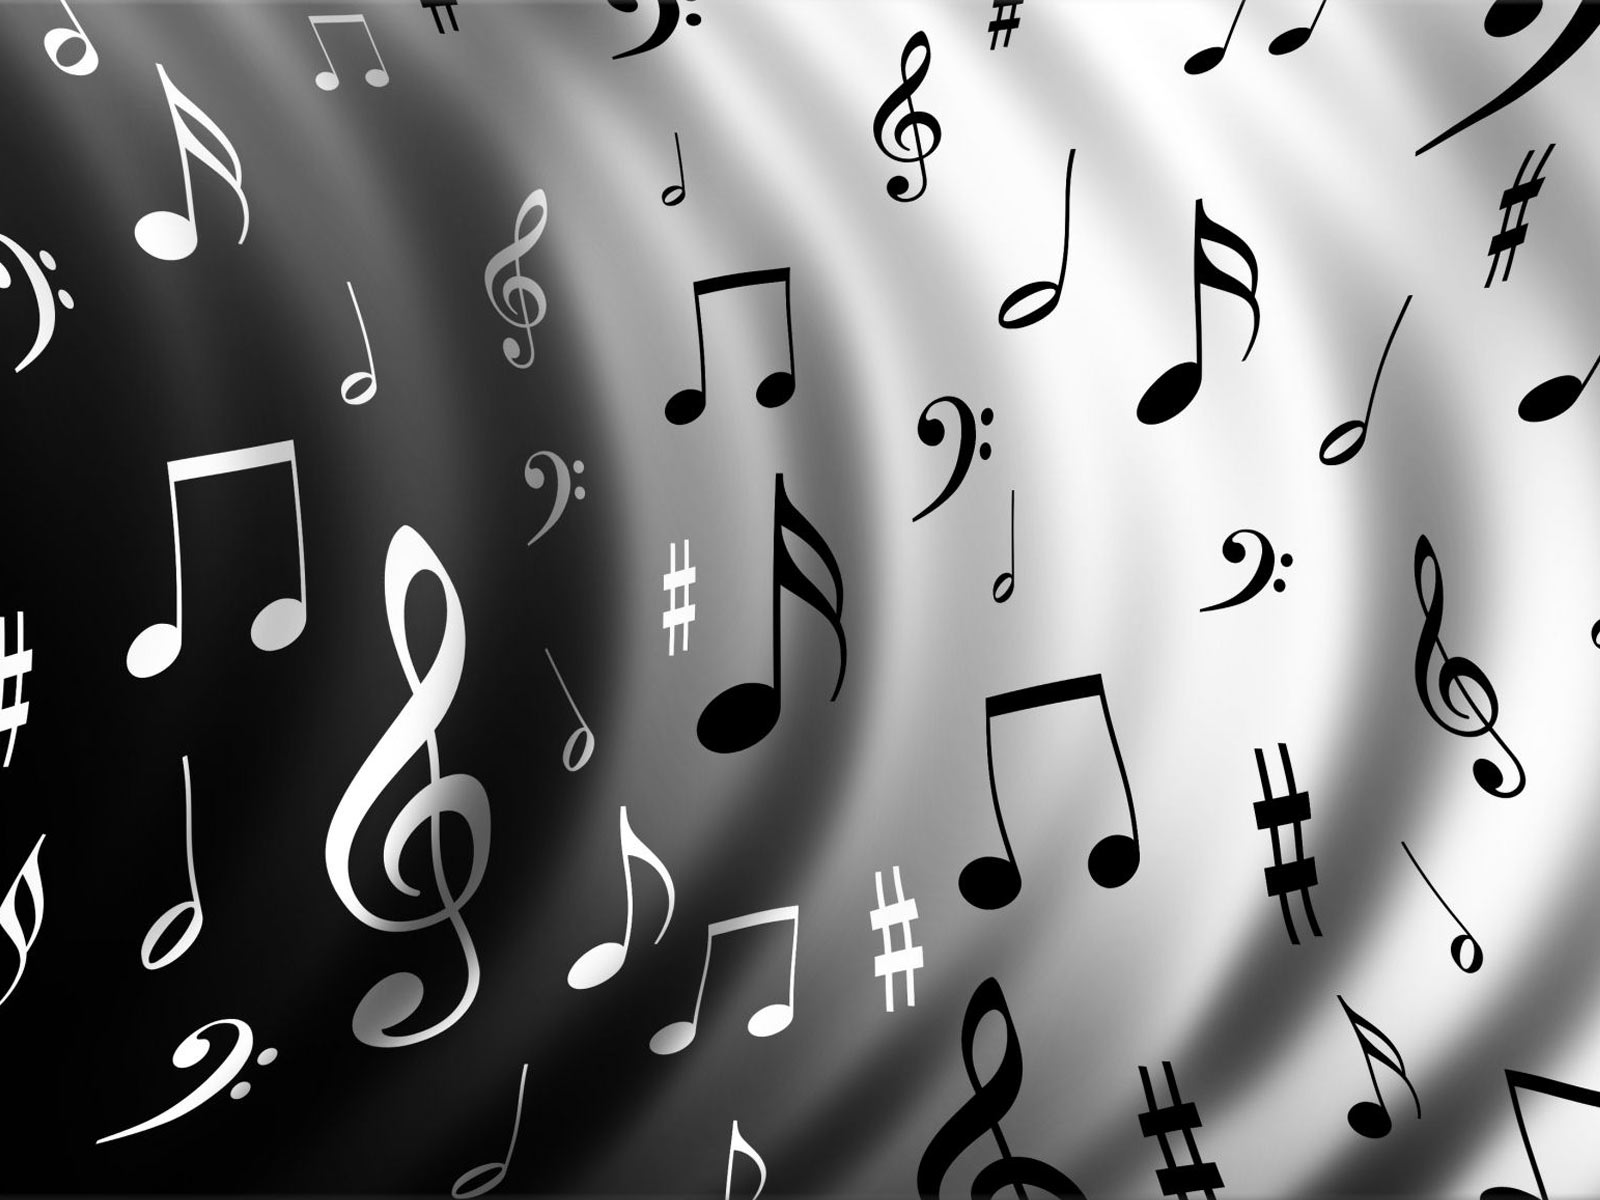 Music Notes Wallpaper: Free Download Wallpaper